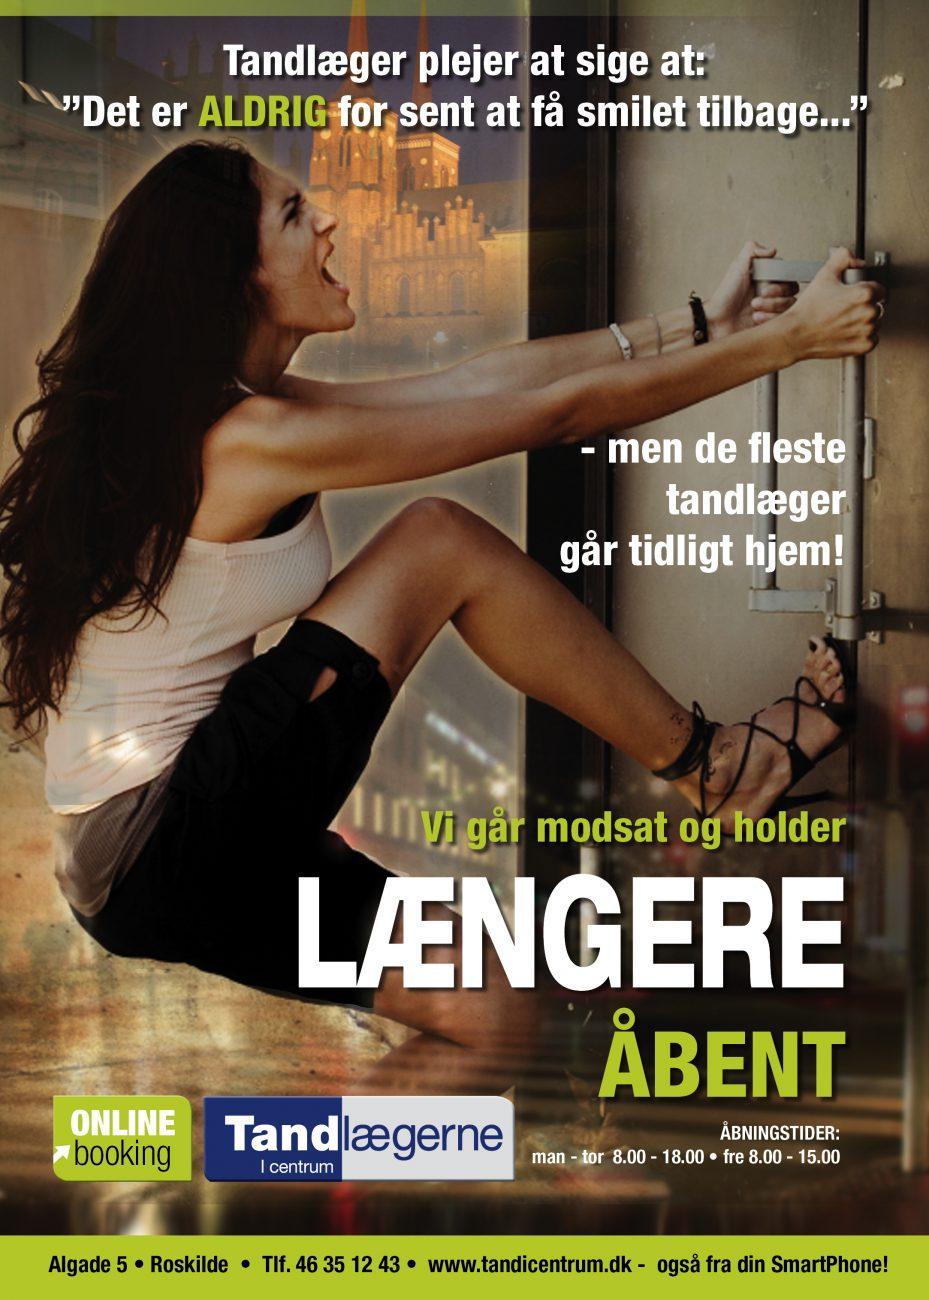 laenge-a%cc%8abent-dsb-v-2-1